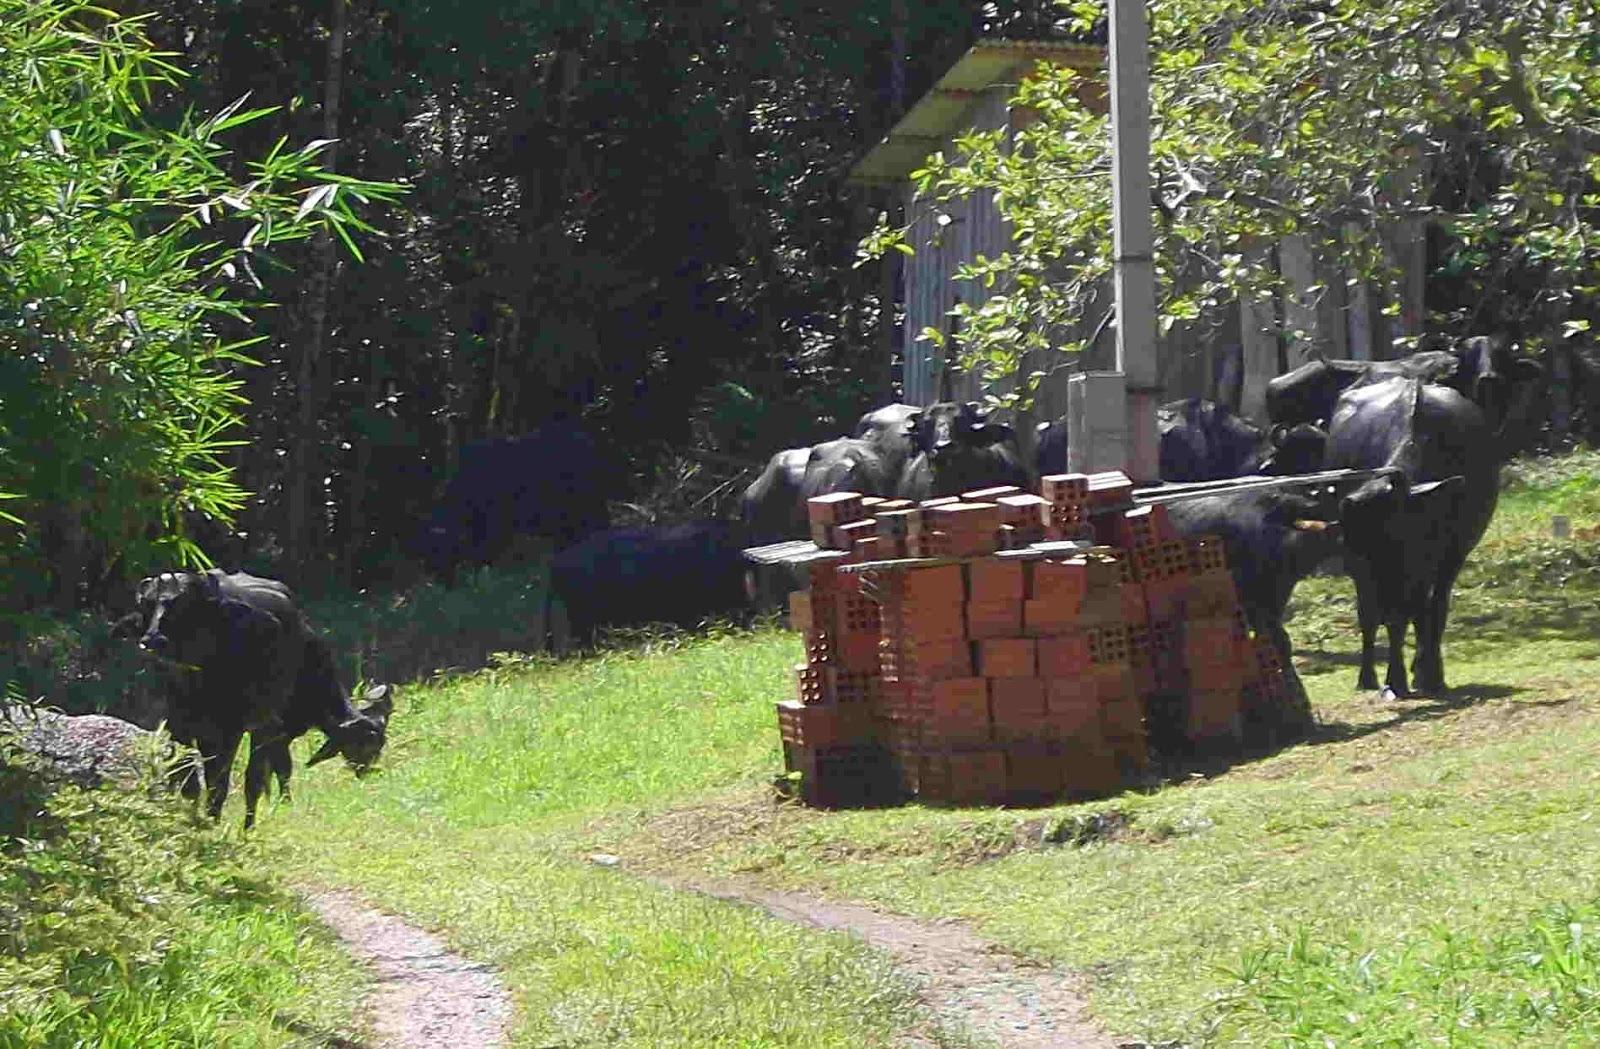 terra verde abenteuer am rande des regenwaldes invasion der b ffel. Black Bedroom Furniture Sets. Home Design Ideas